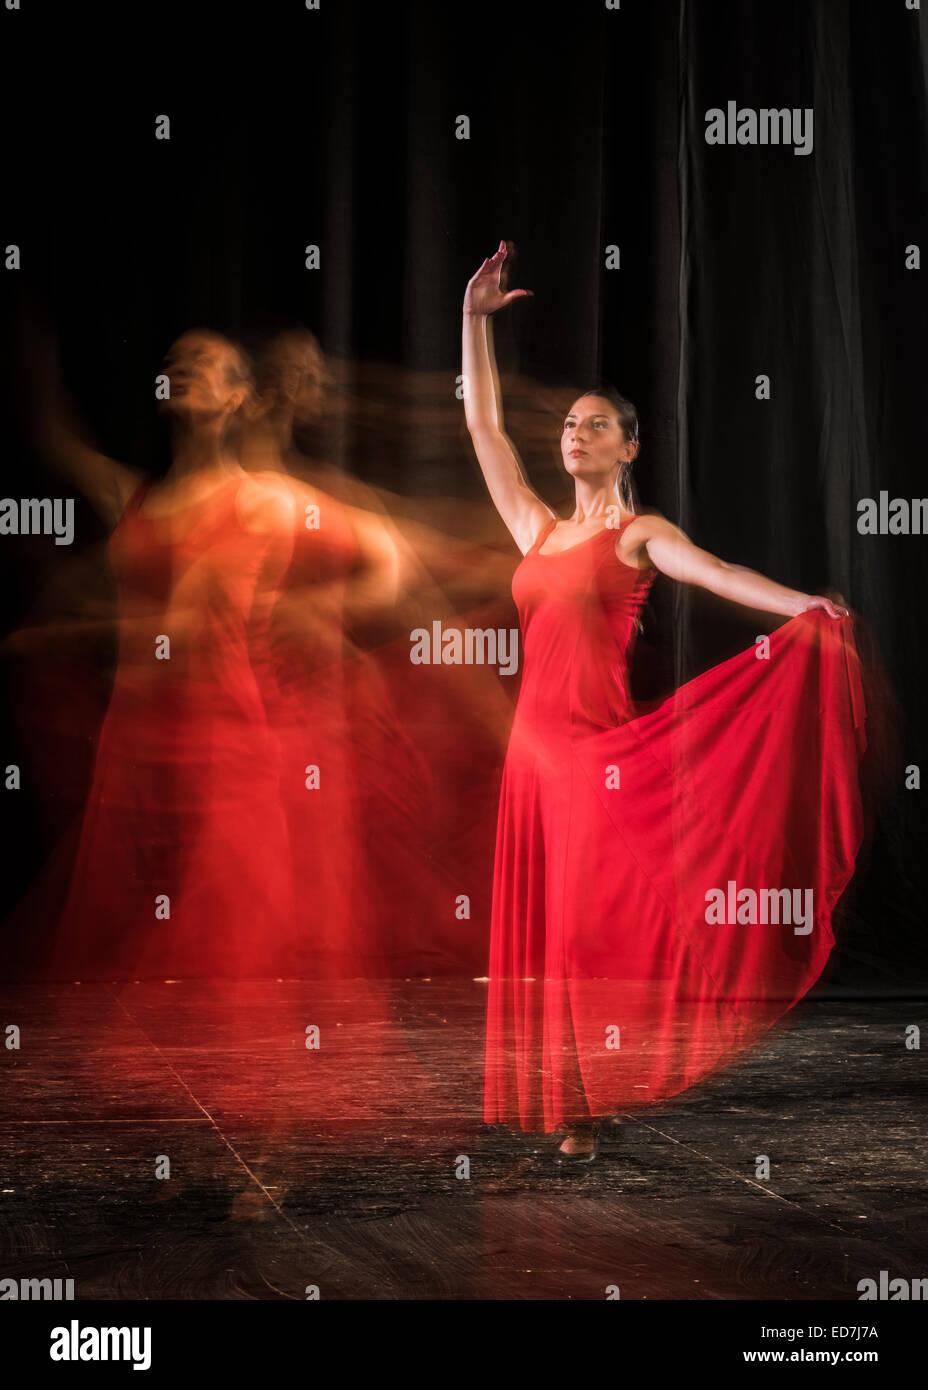 Spanish flamenco dancer. - Stock Image